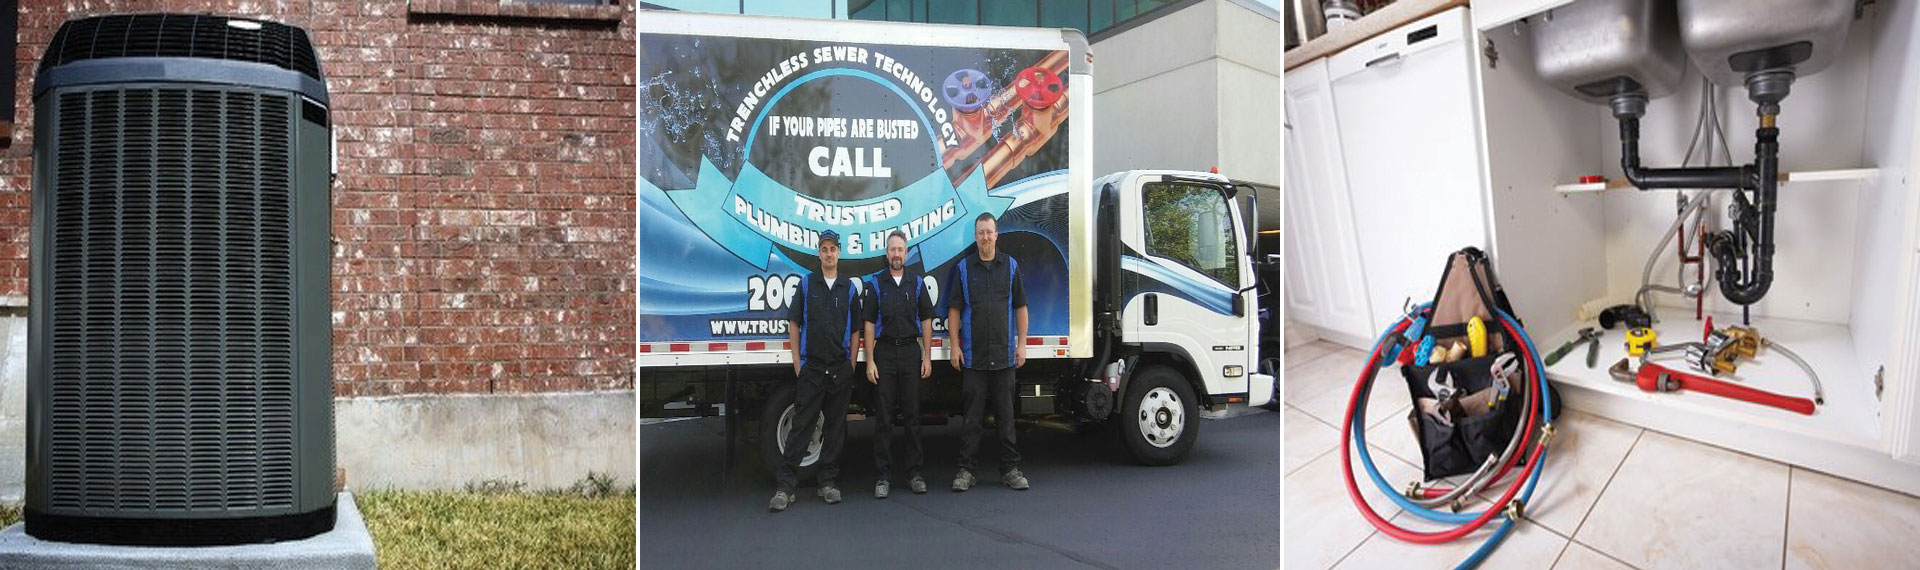 Trusted Plumbing & Heating LLC Sammamish WA